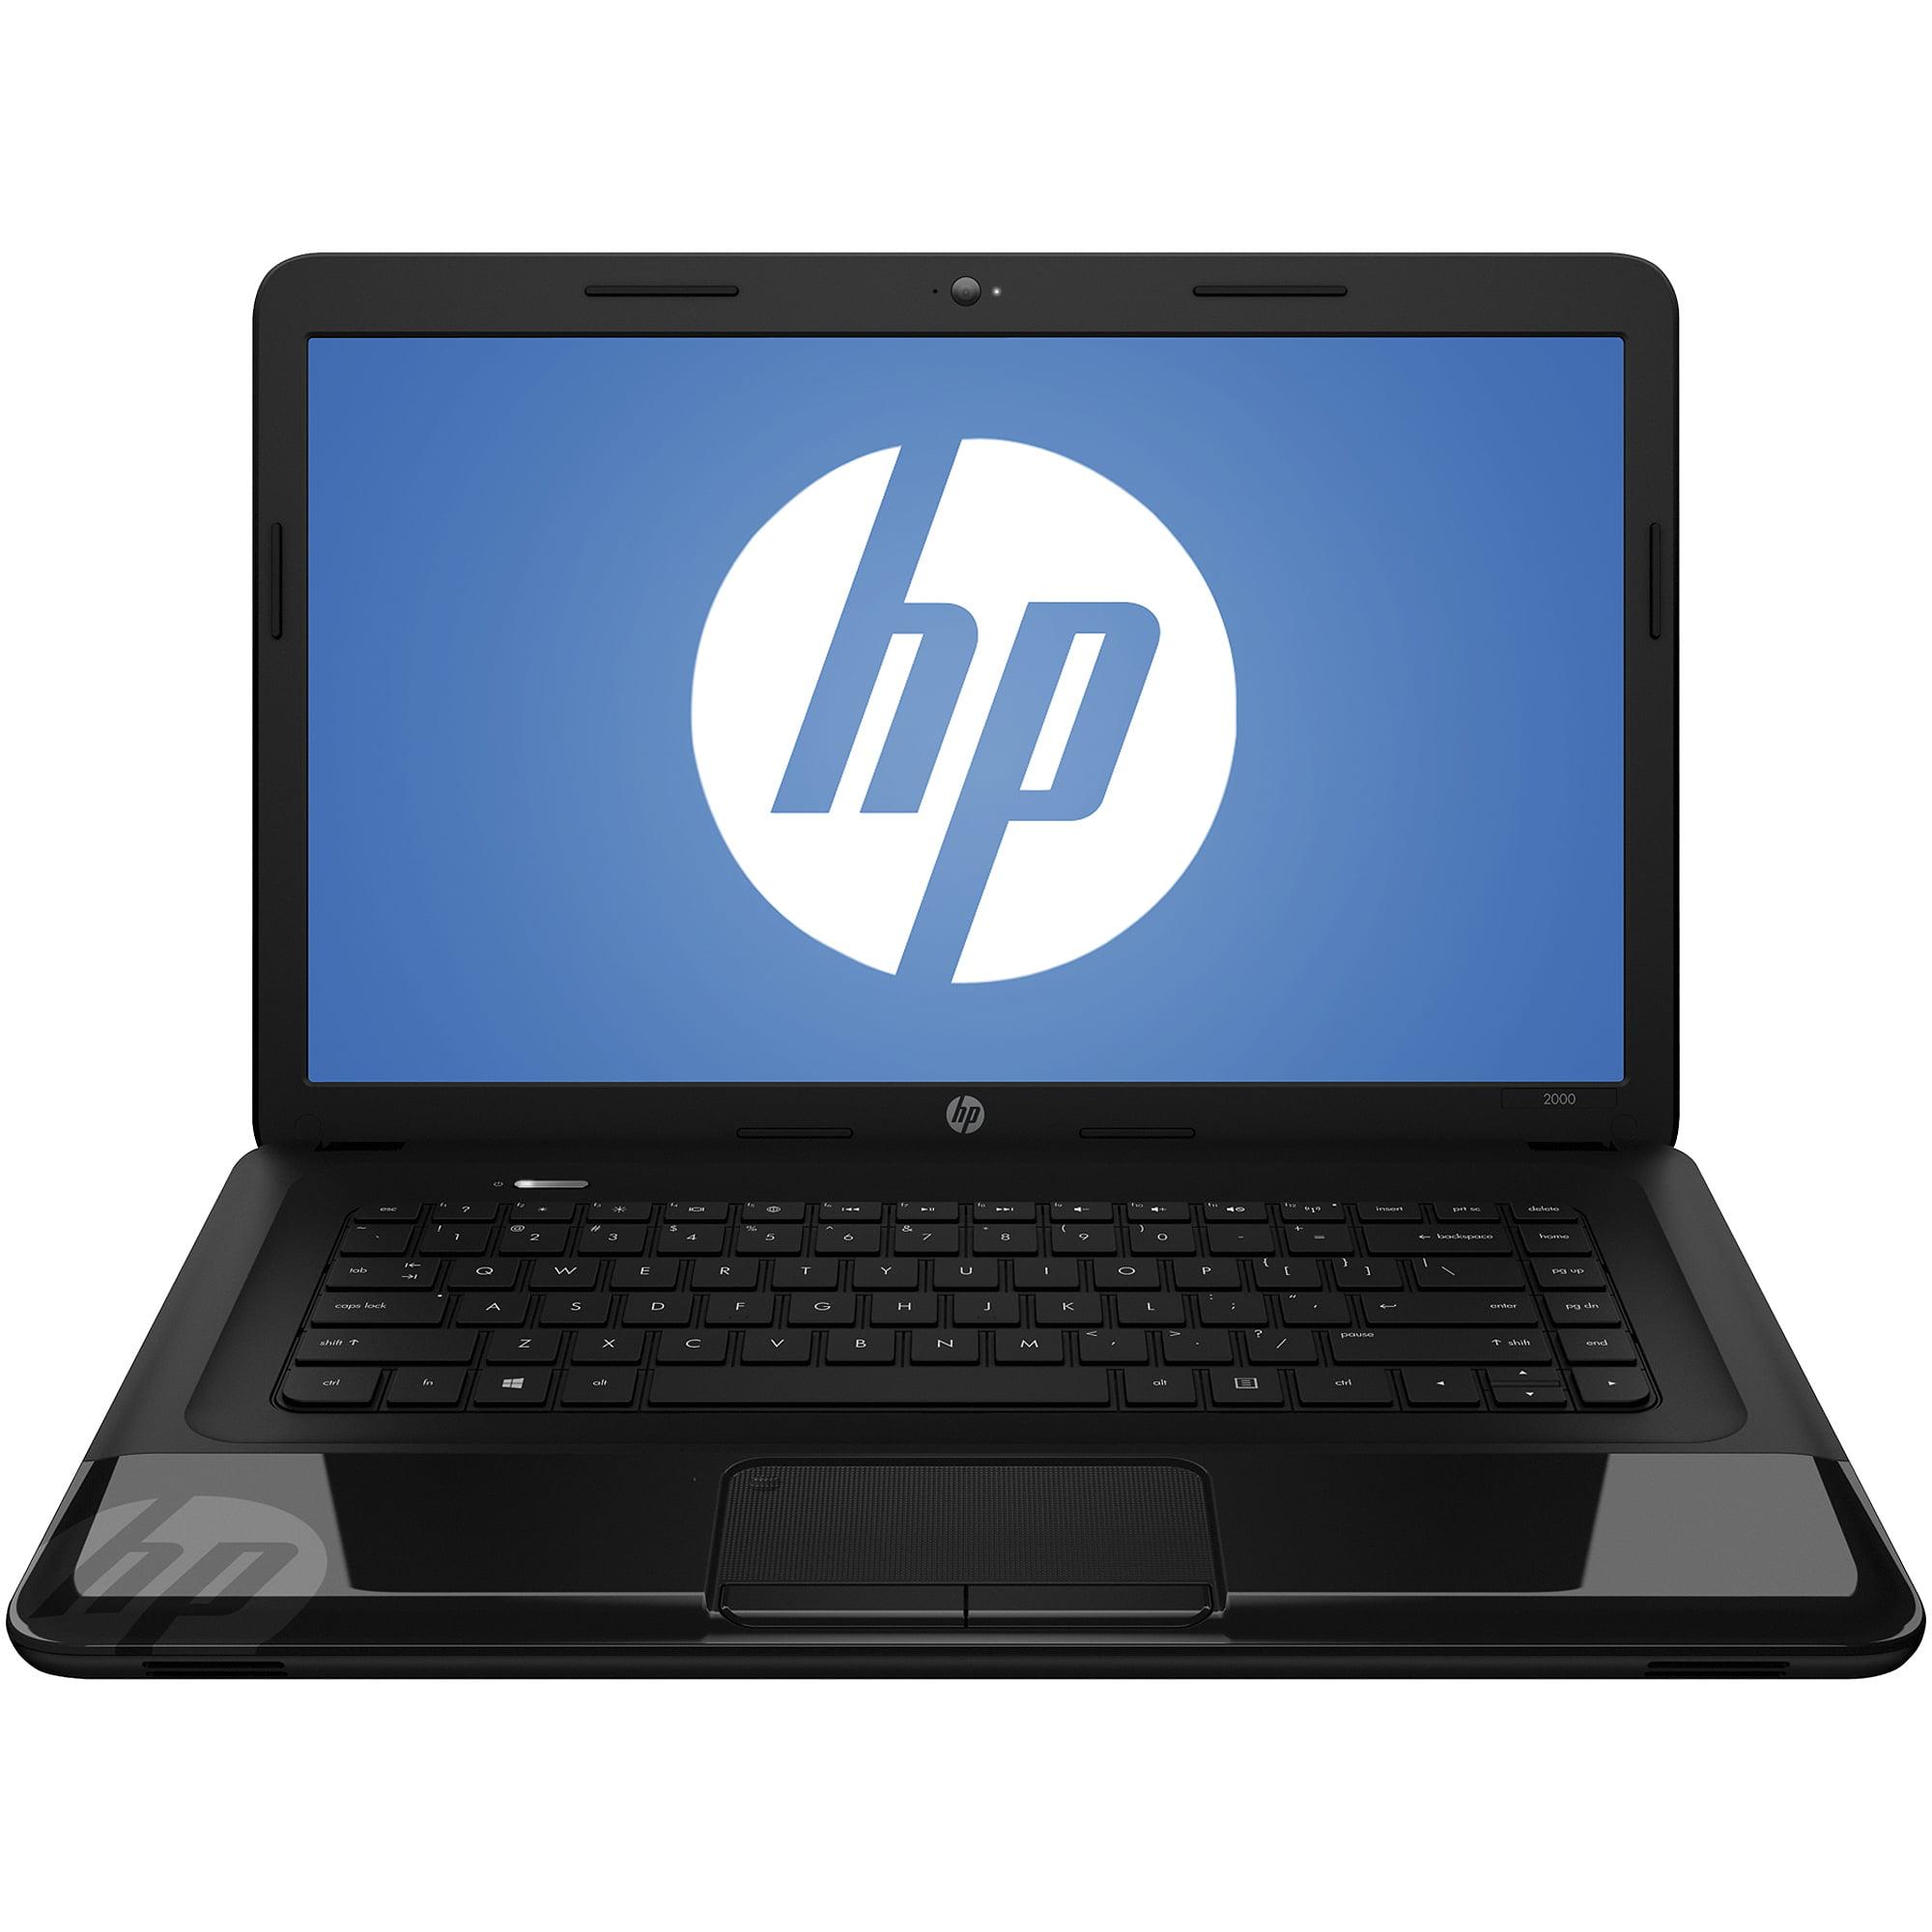 "HP Refurbished Black Licorice 15.6"" 2000-2b29WM Laptop PC with Intel Pentium B960 Processor and Windows 8 Operating System"